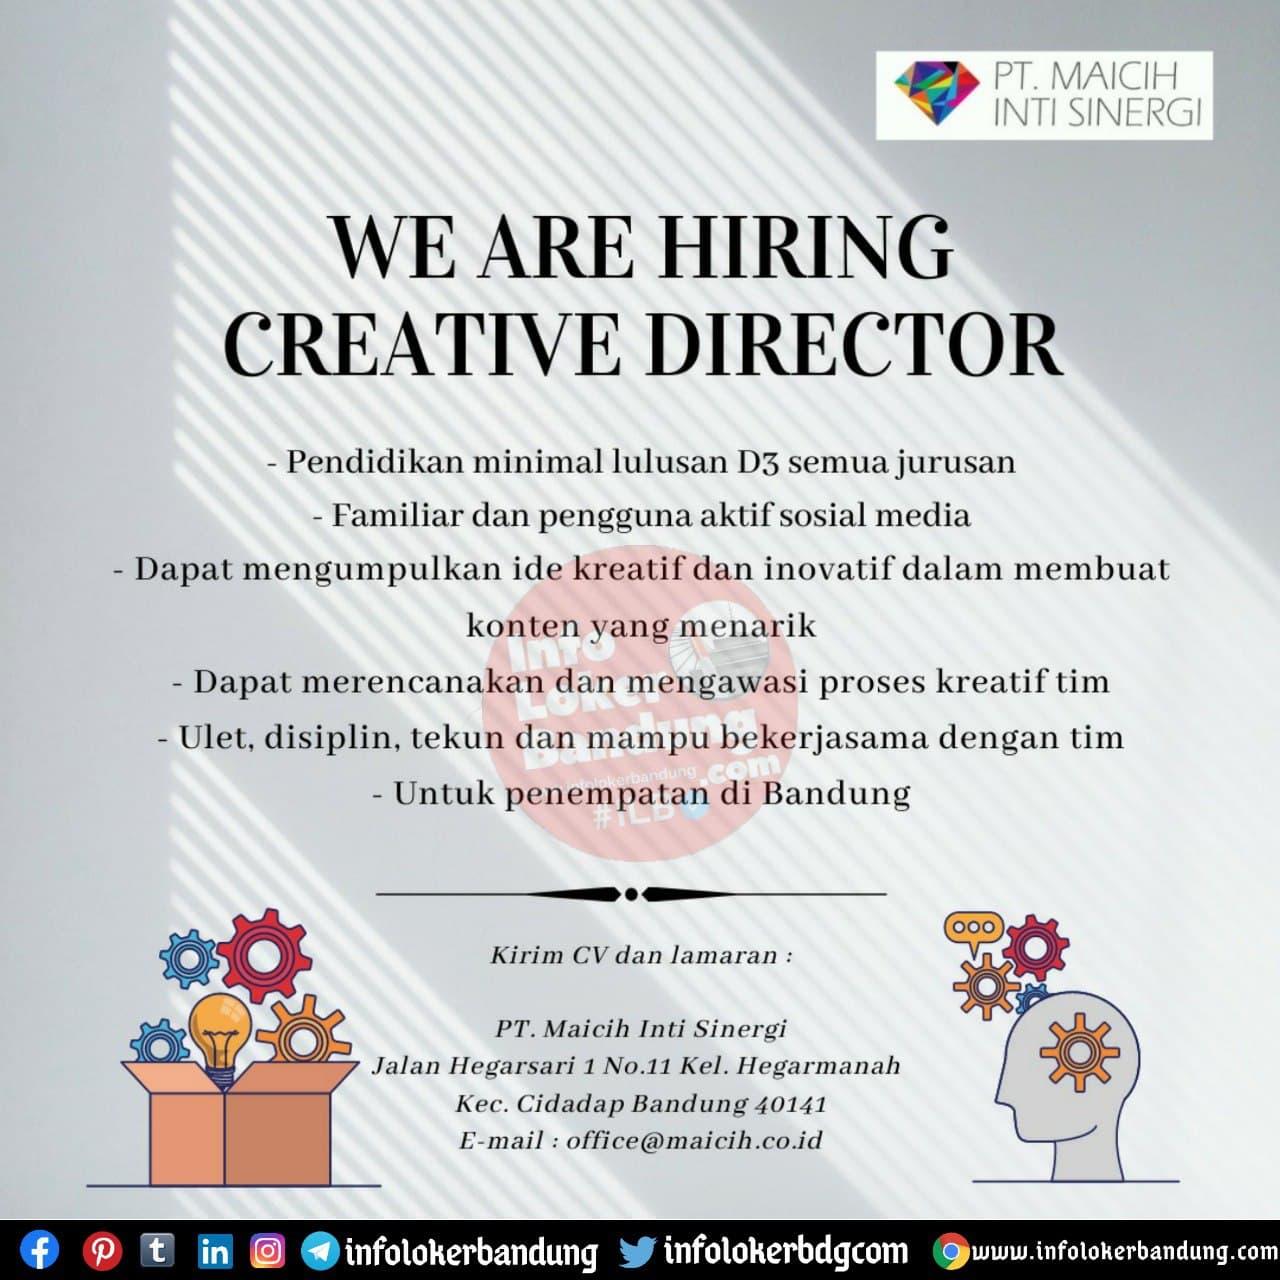 Lowongan Kerja Creative Director PT. Maicih Inti Sinergi Bandung November 2020